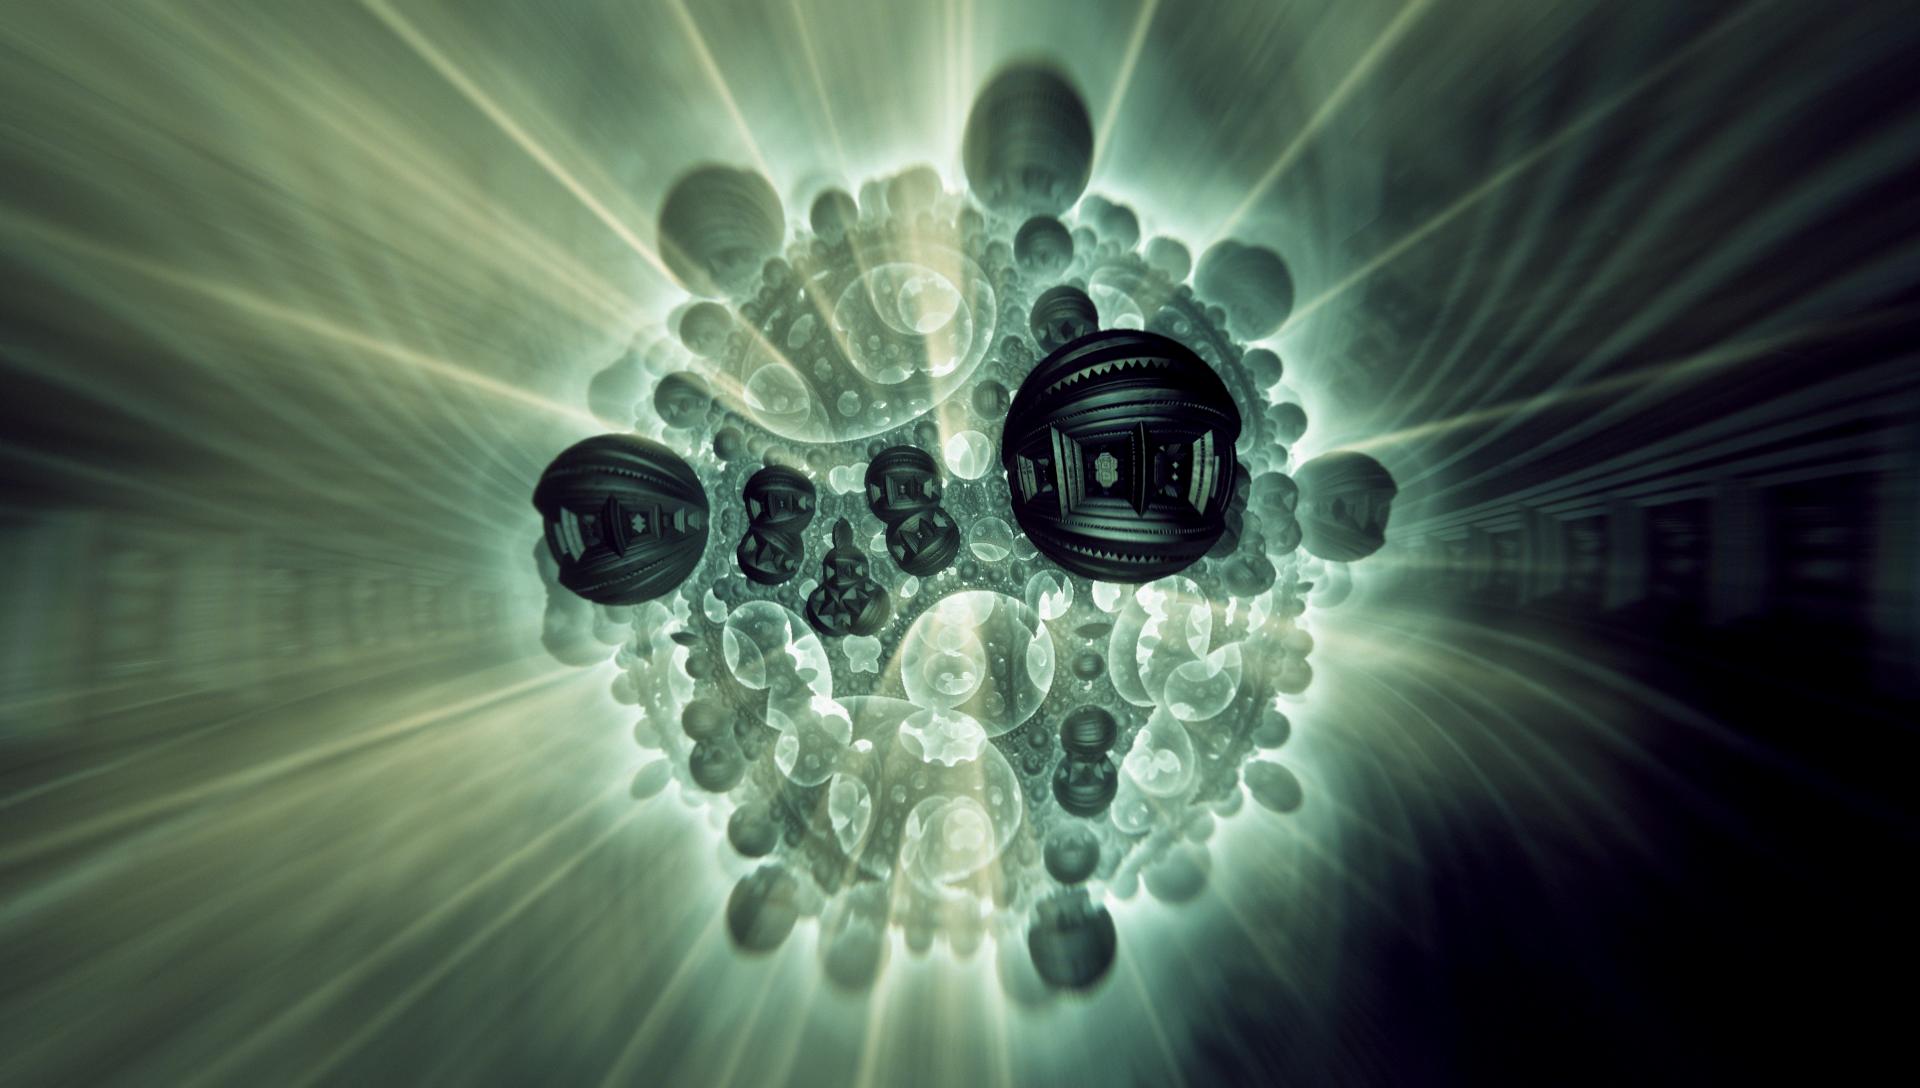 10 - ELECTRON NUCLEUS